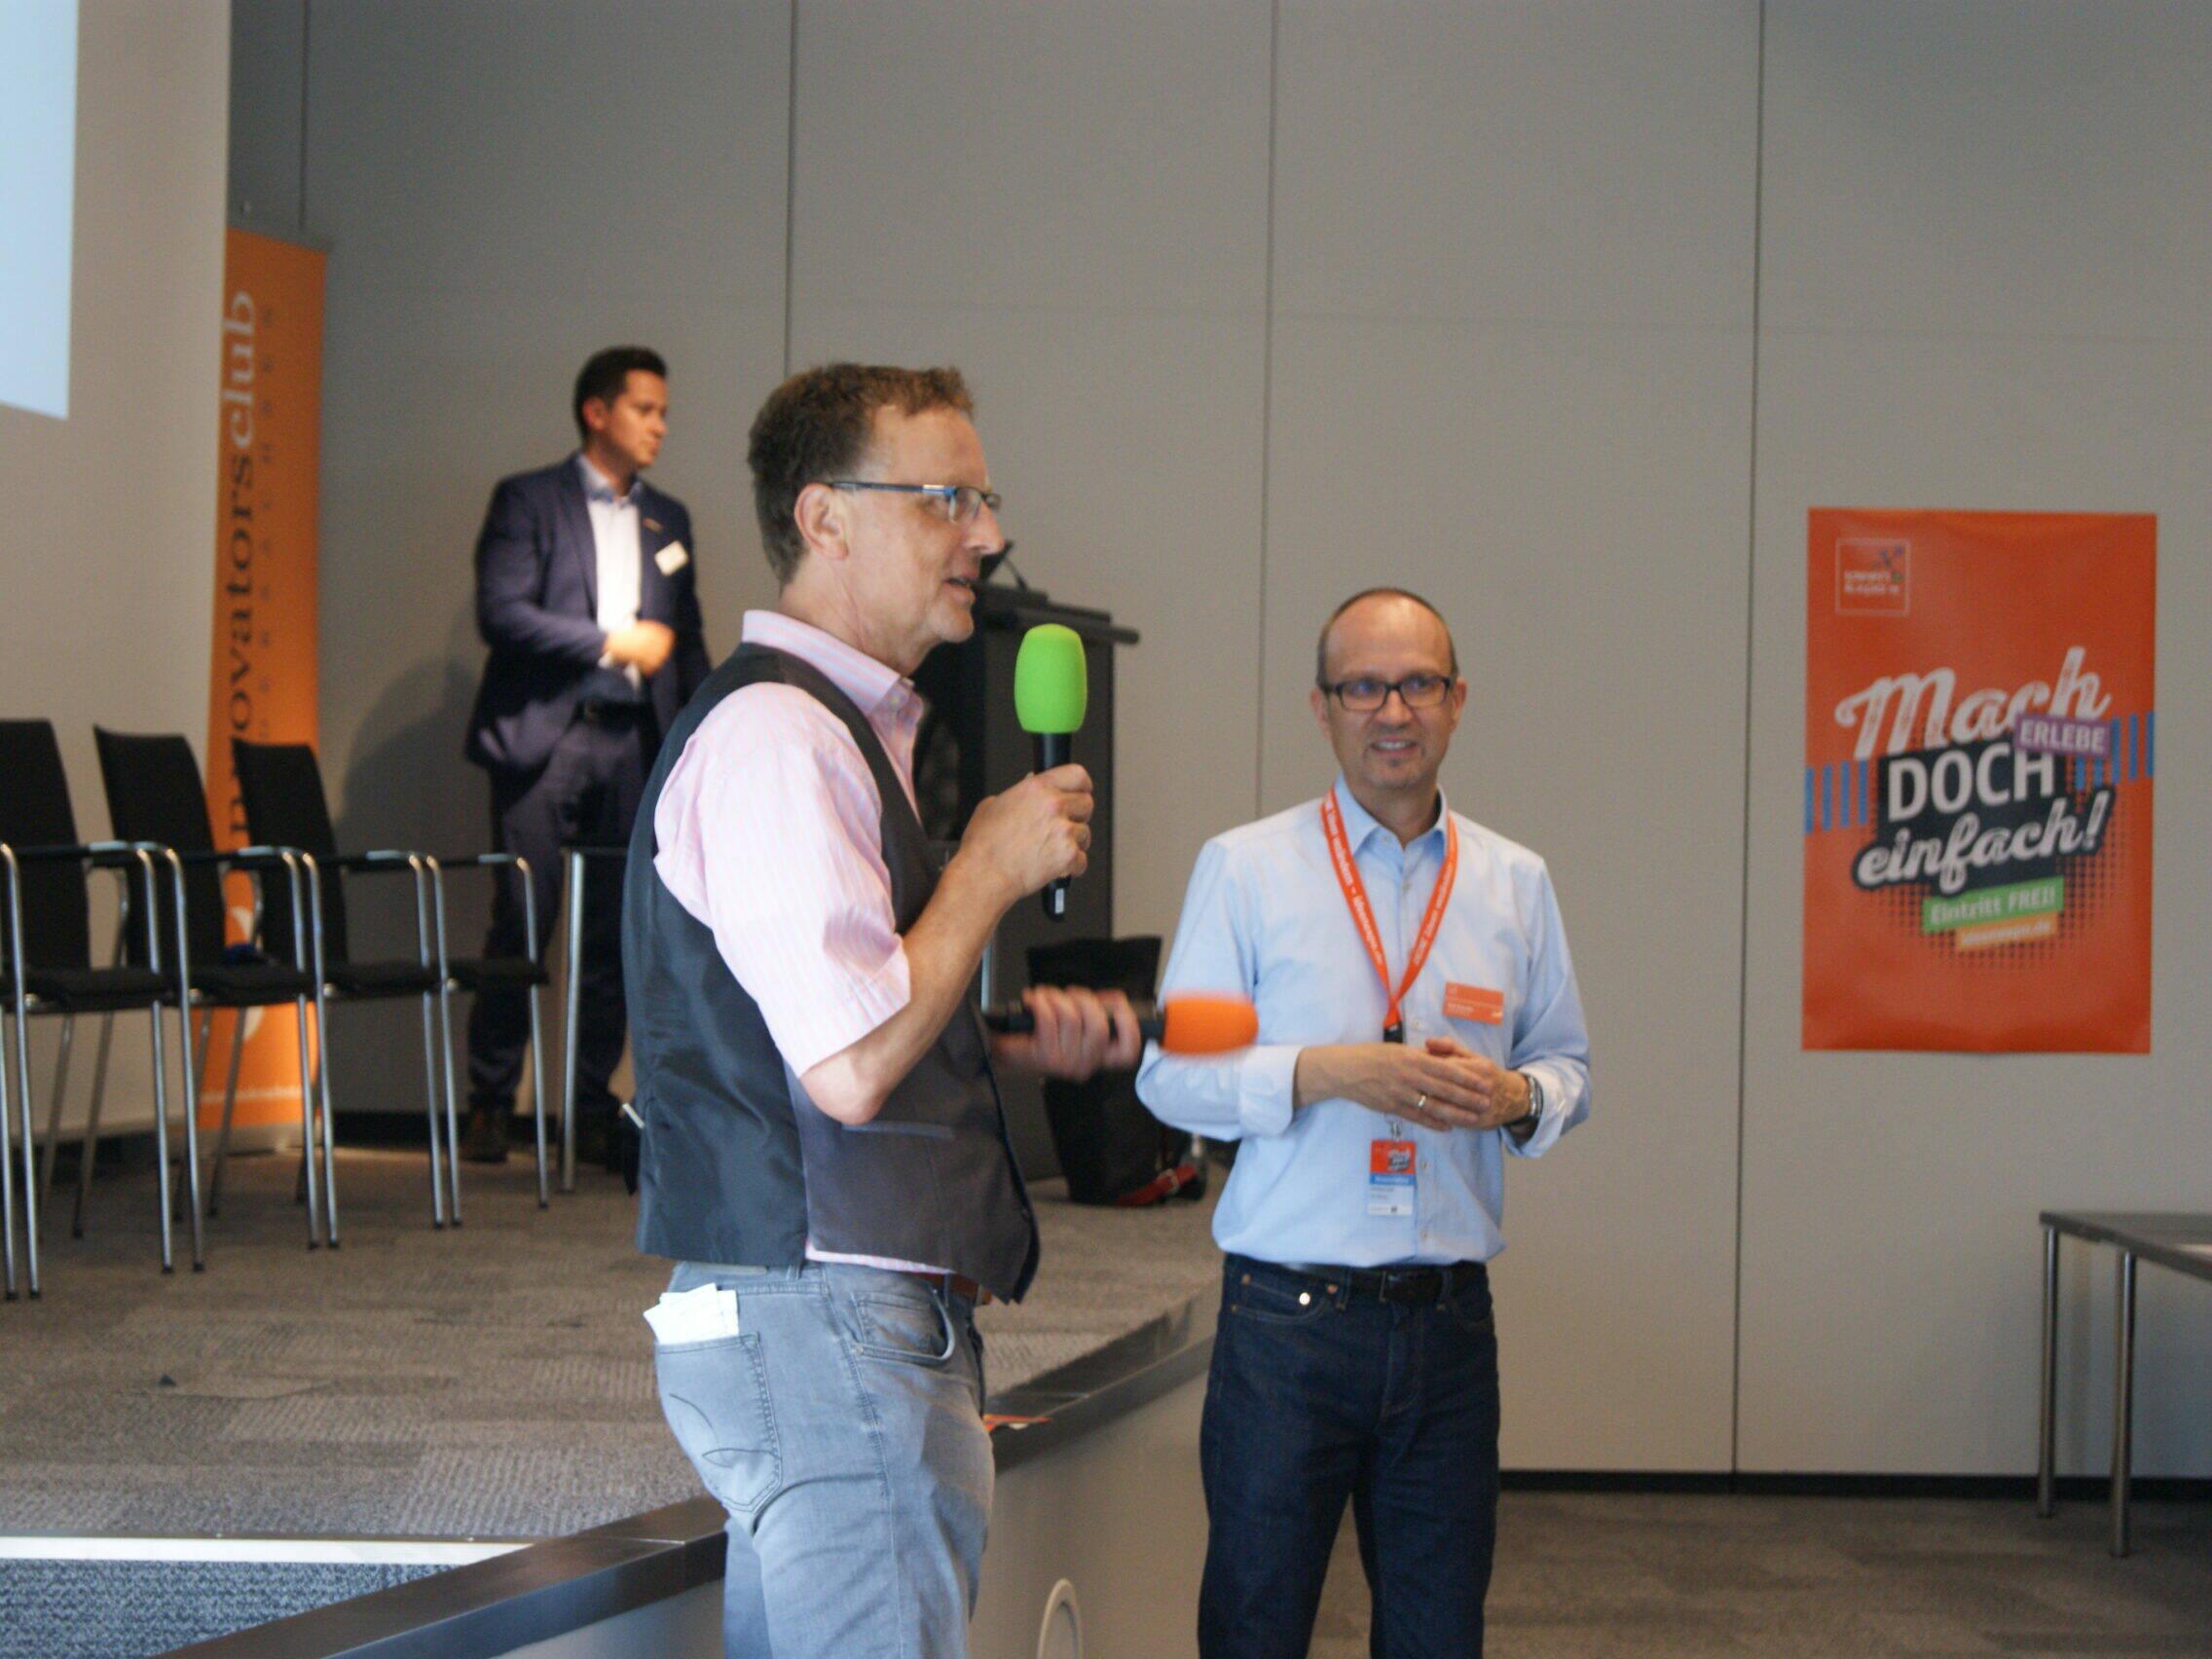 Veranstaltung innovatorsclub - 2 Redner bei Vortrag